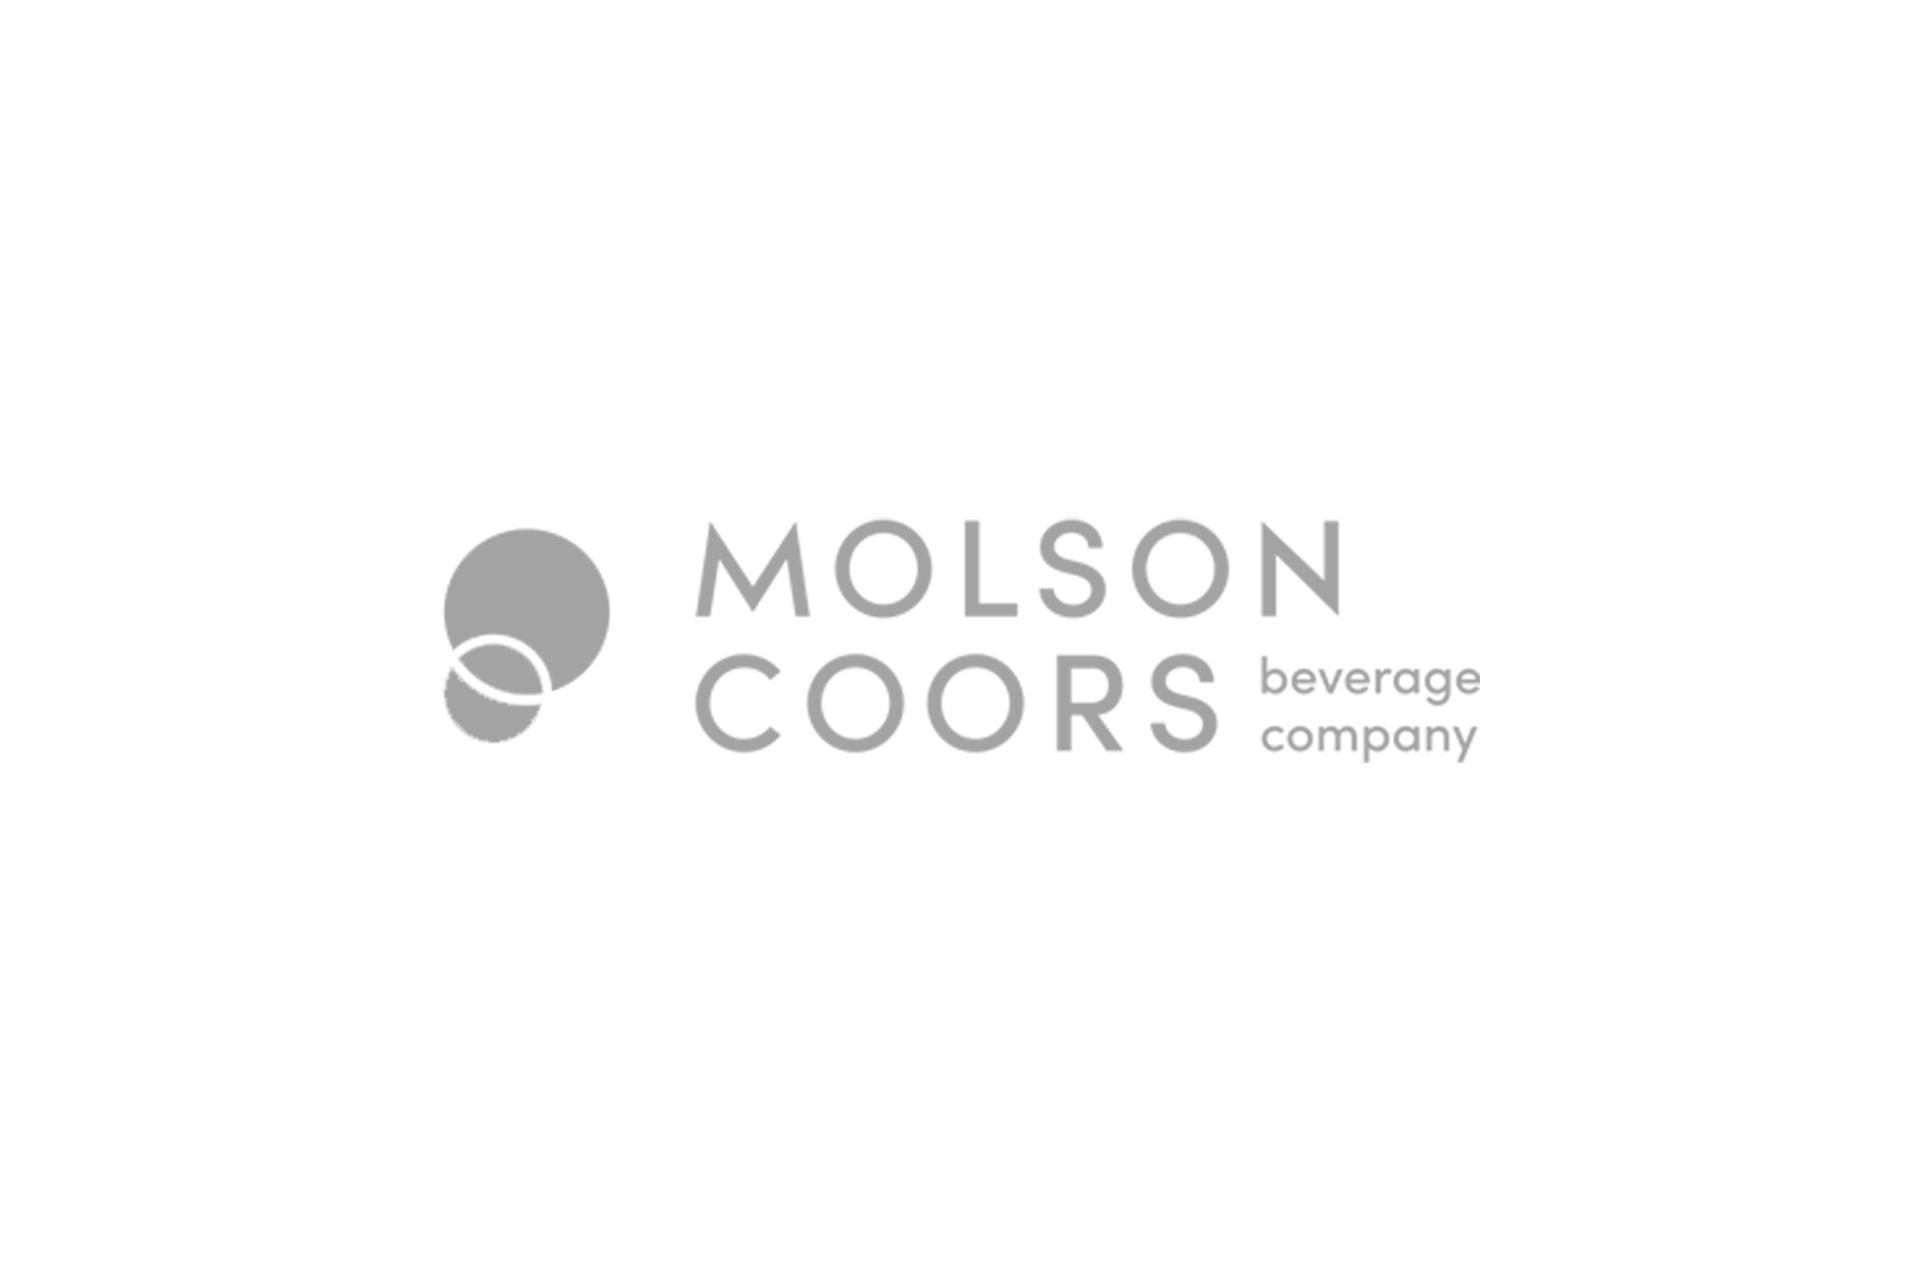 molson coors logo grey